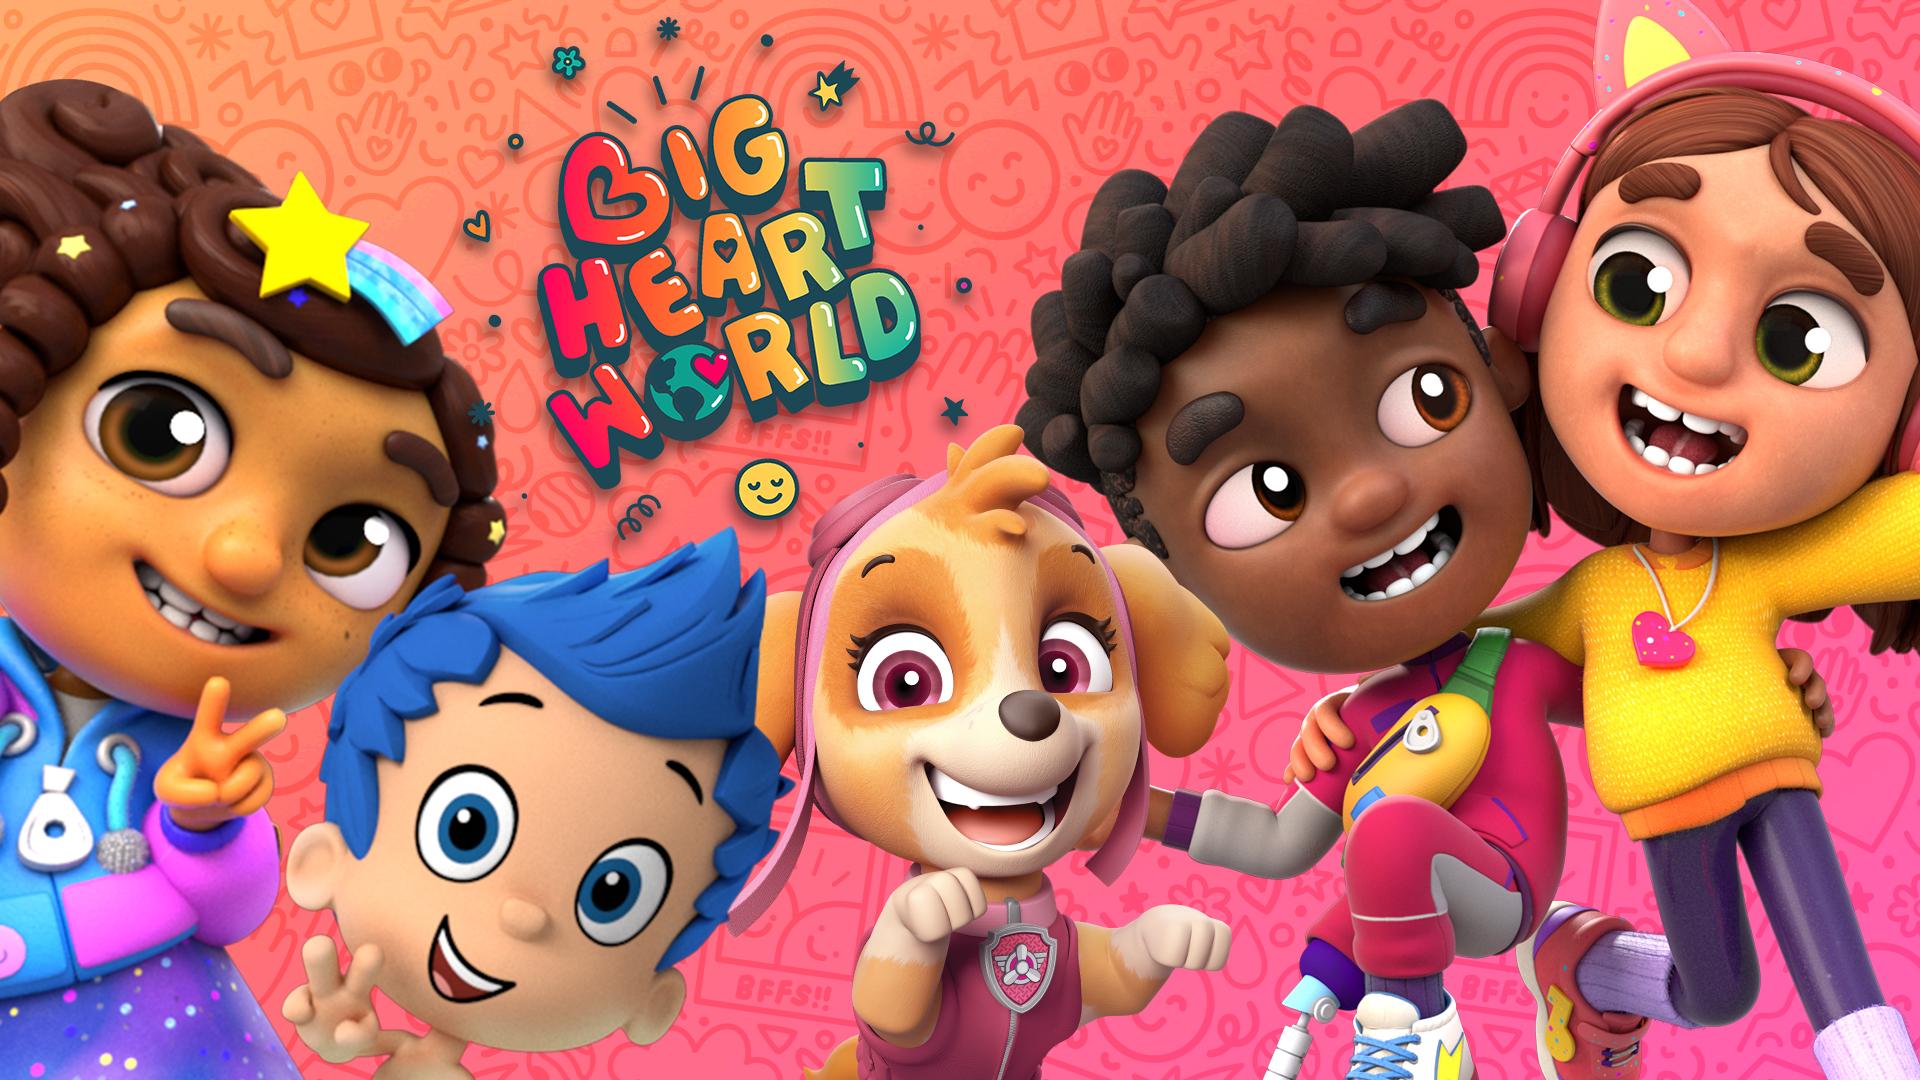 Big Heart World Season 1